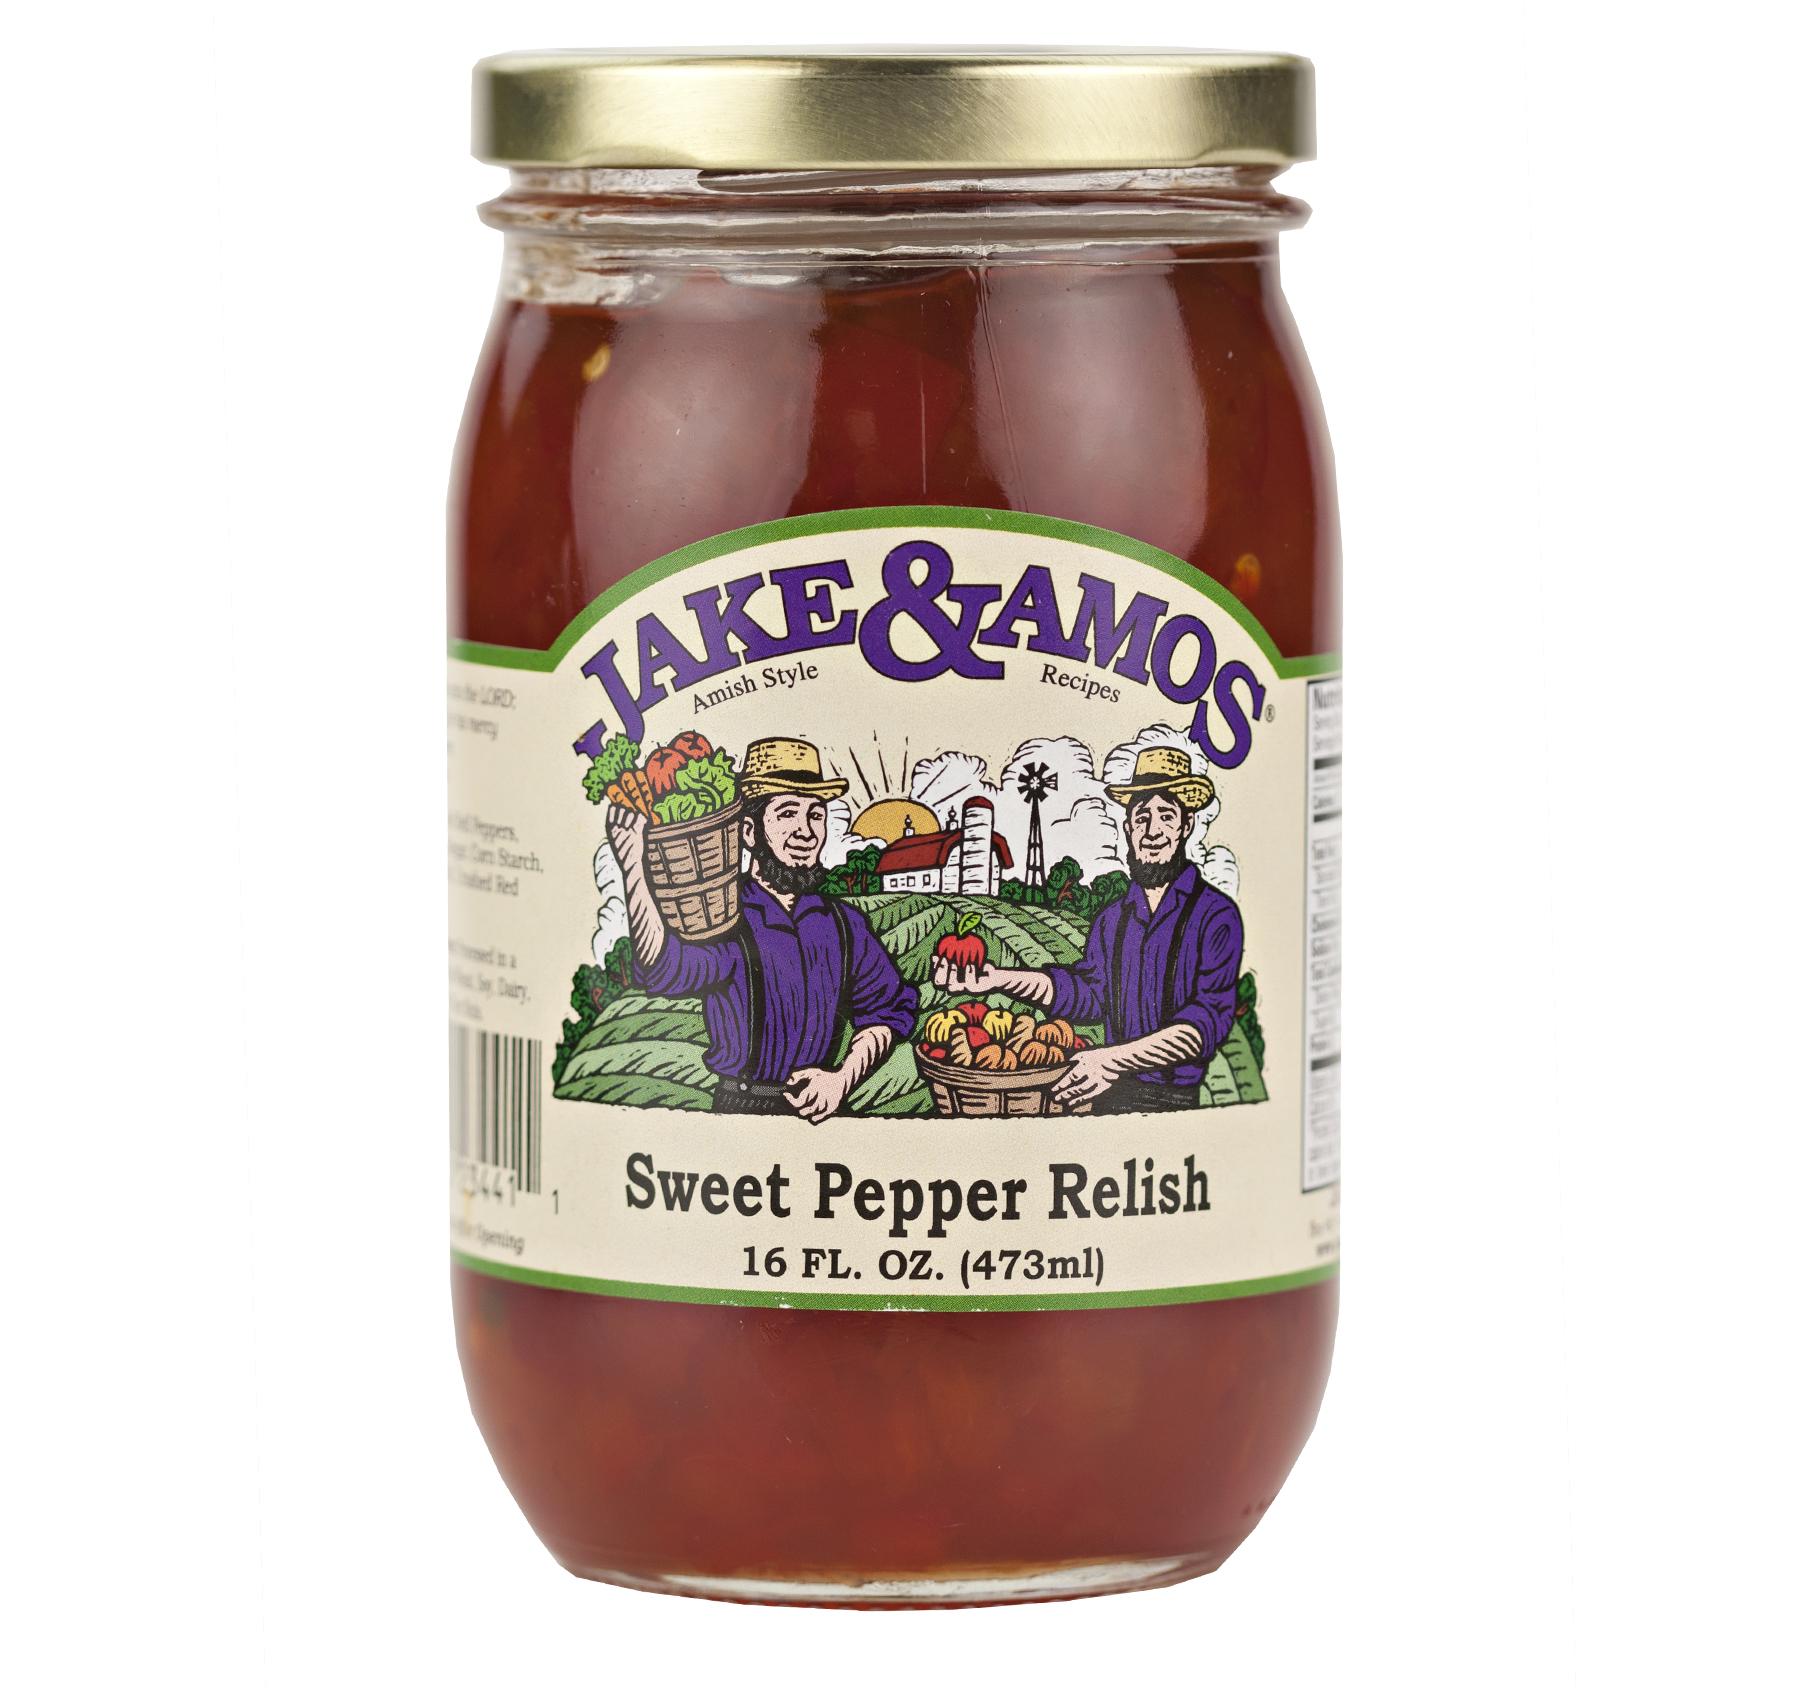 Jake & Amos Sweet Pepper Relish 16 oz. Jar (2 Jars)